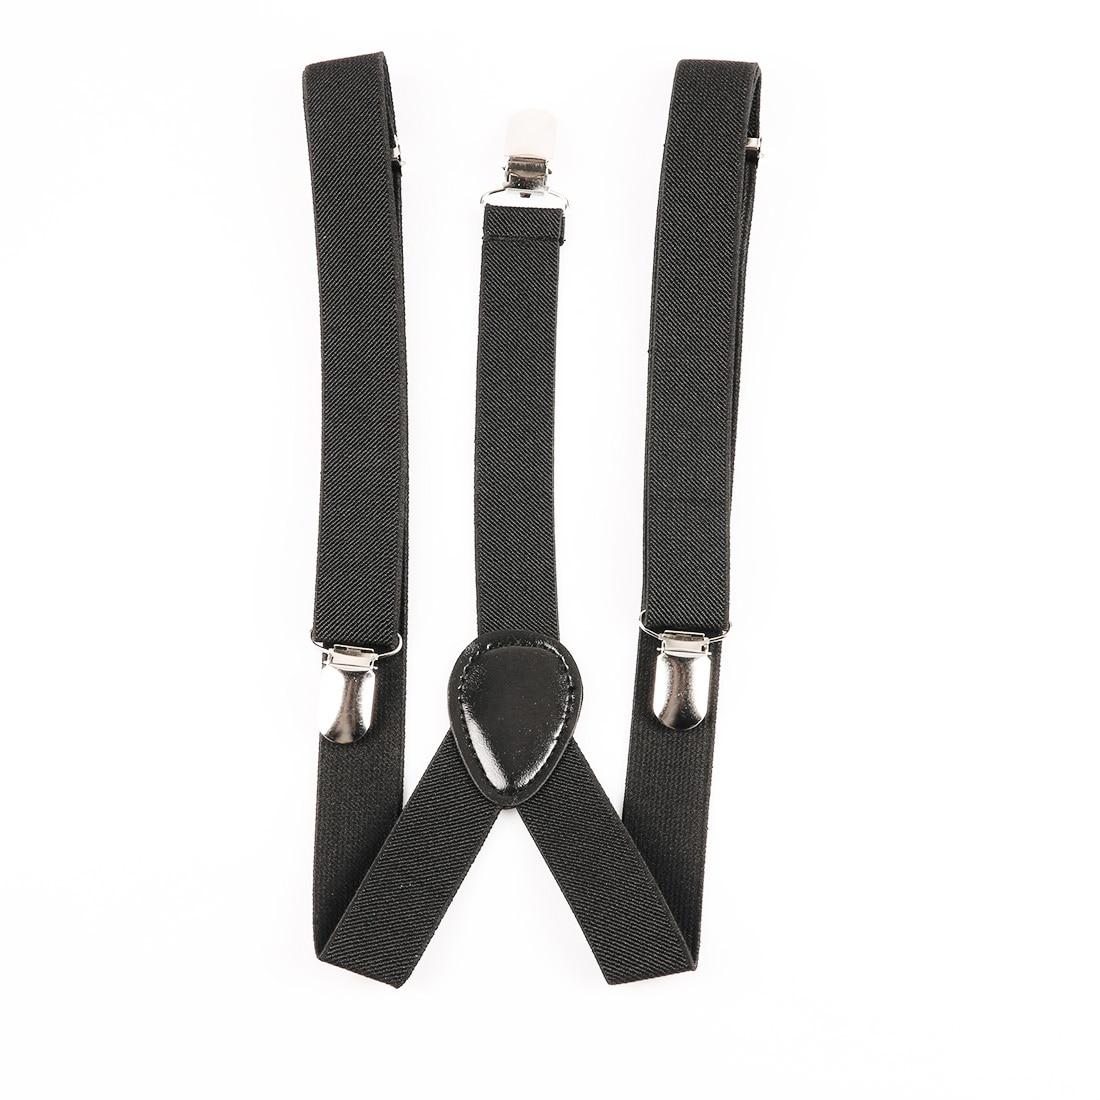 New Style Black Mens Womens Unisex Clip-on Suspenders Elastic Y-Shape Adjustable Braces Solids 25*100cm Colorful